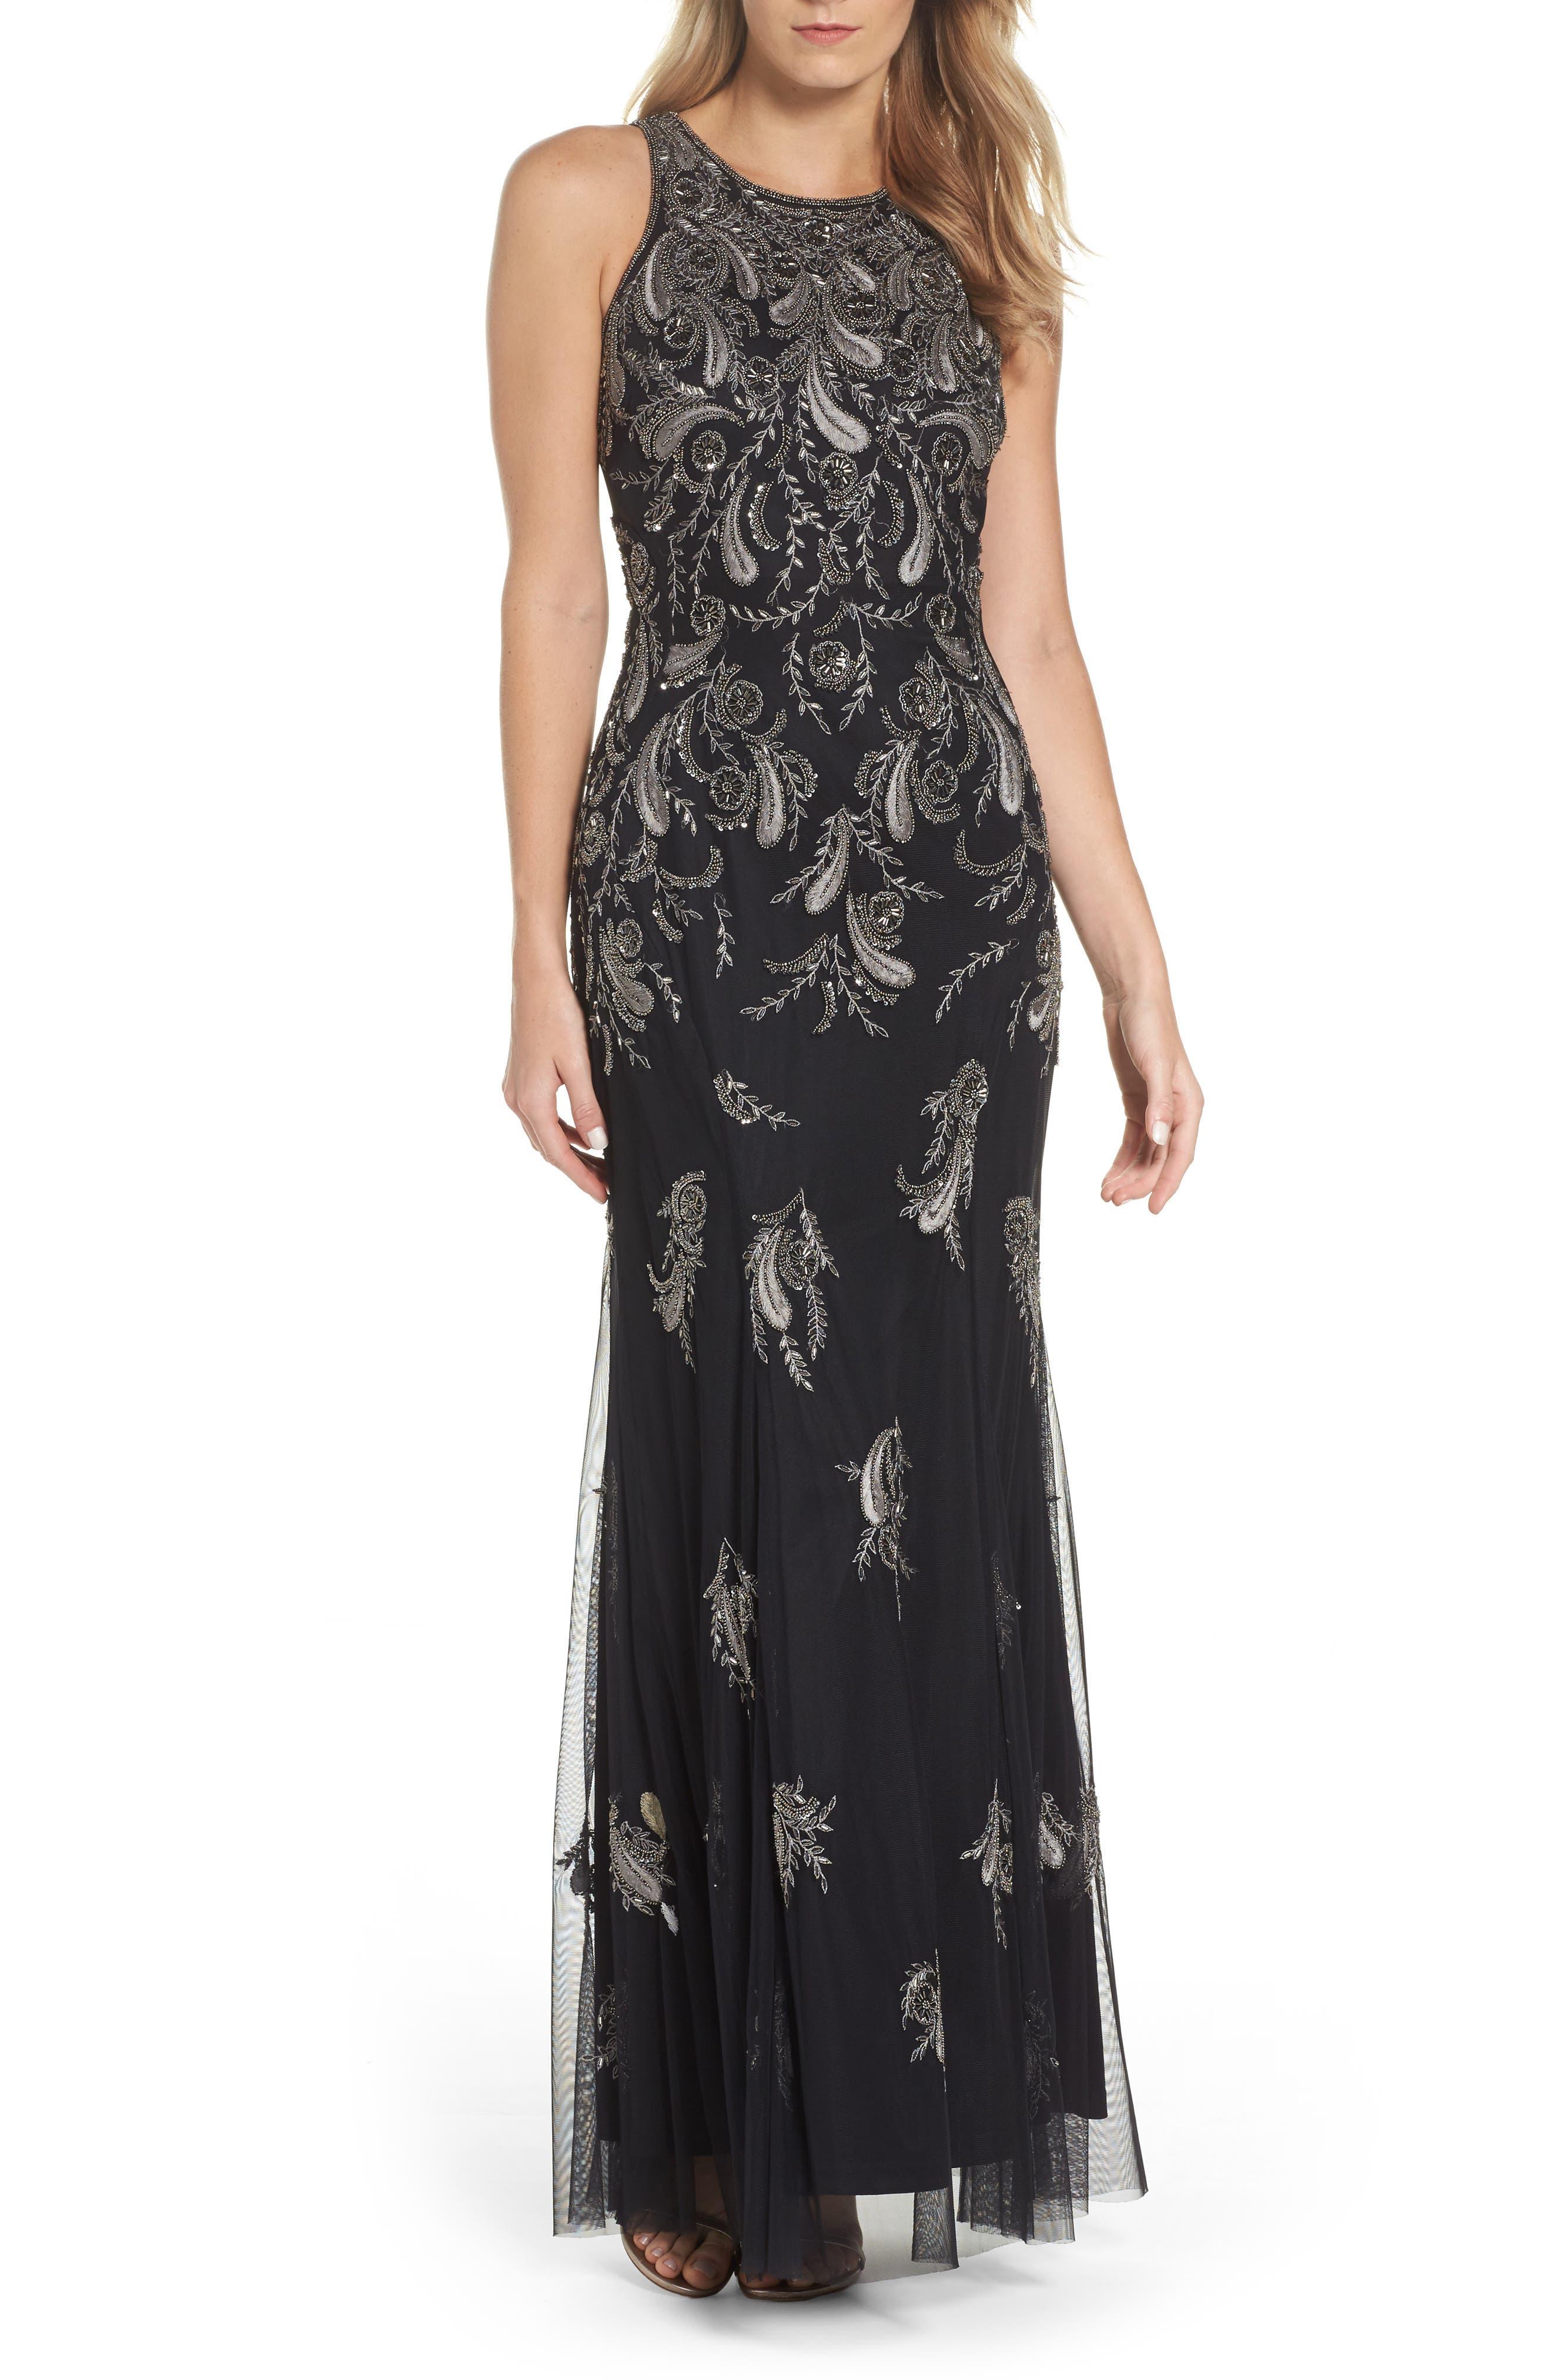 Alternate Image 1 Selected - Adrianna Papell Embellished Sheer Back Maxi Dress